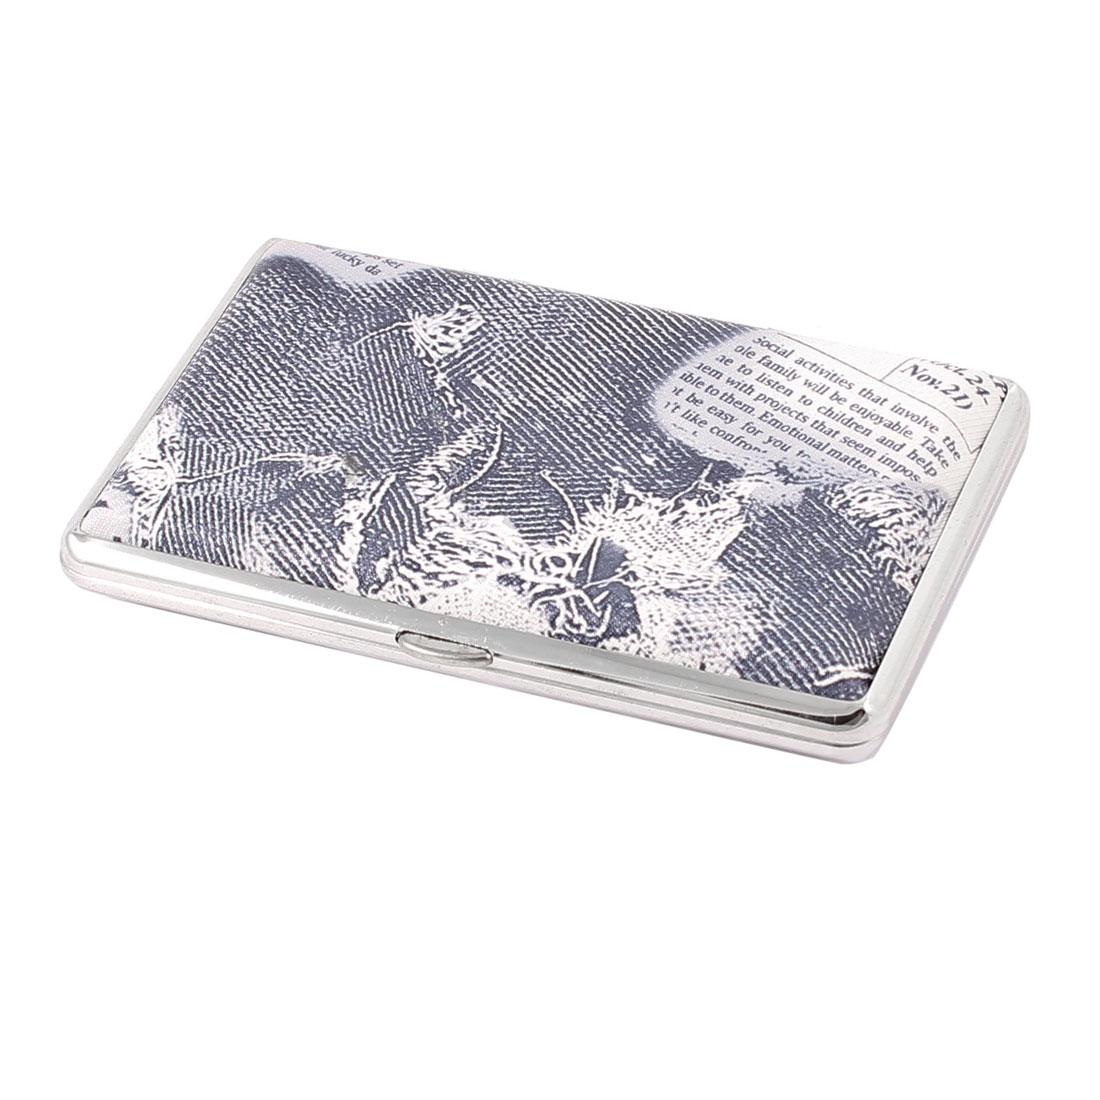 Man White Steel Gray Letter Pattern Double Sides Cigarette Case Box Holder